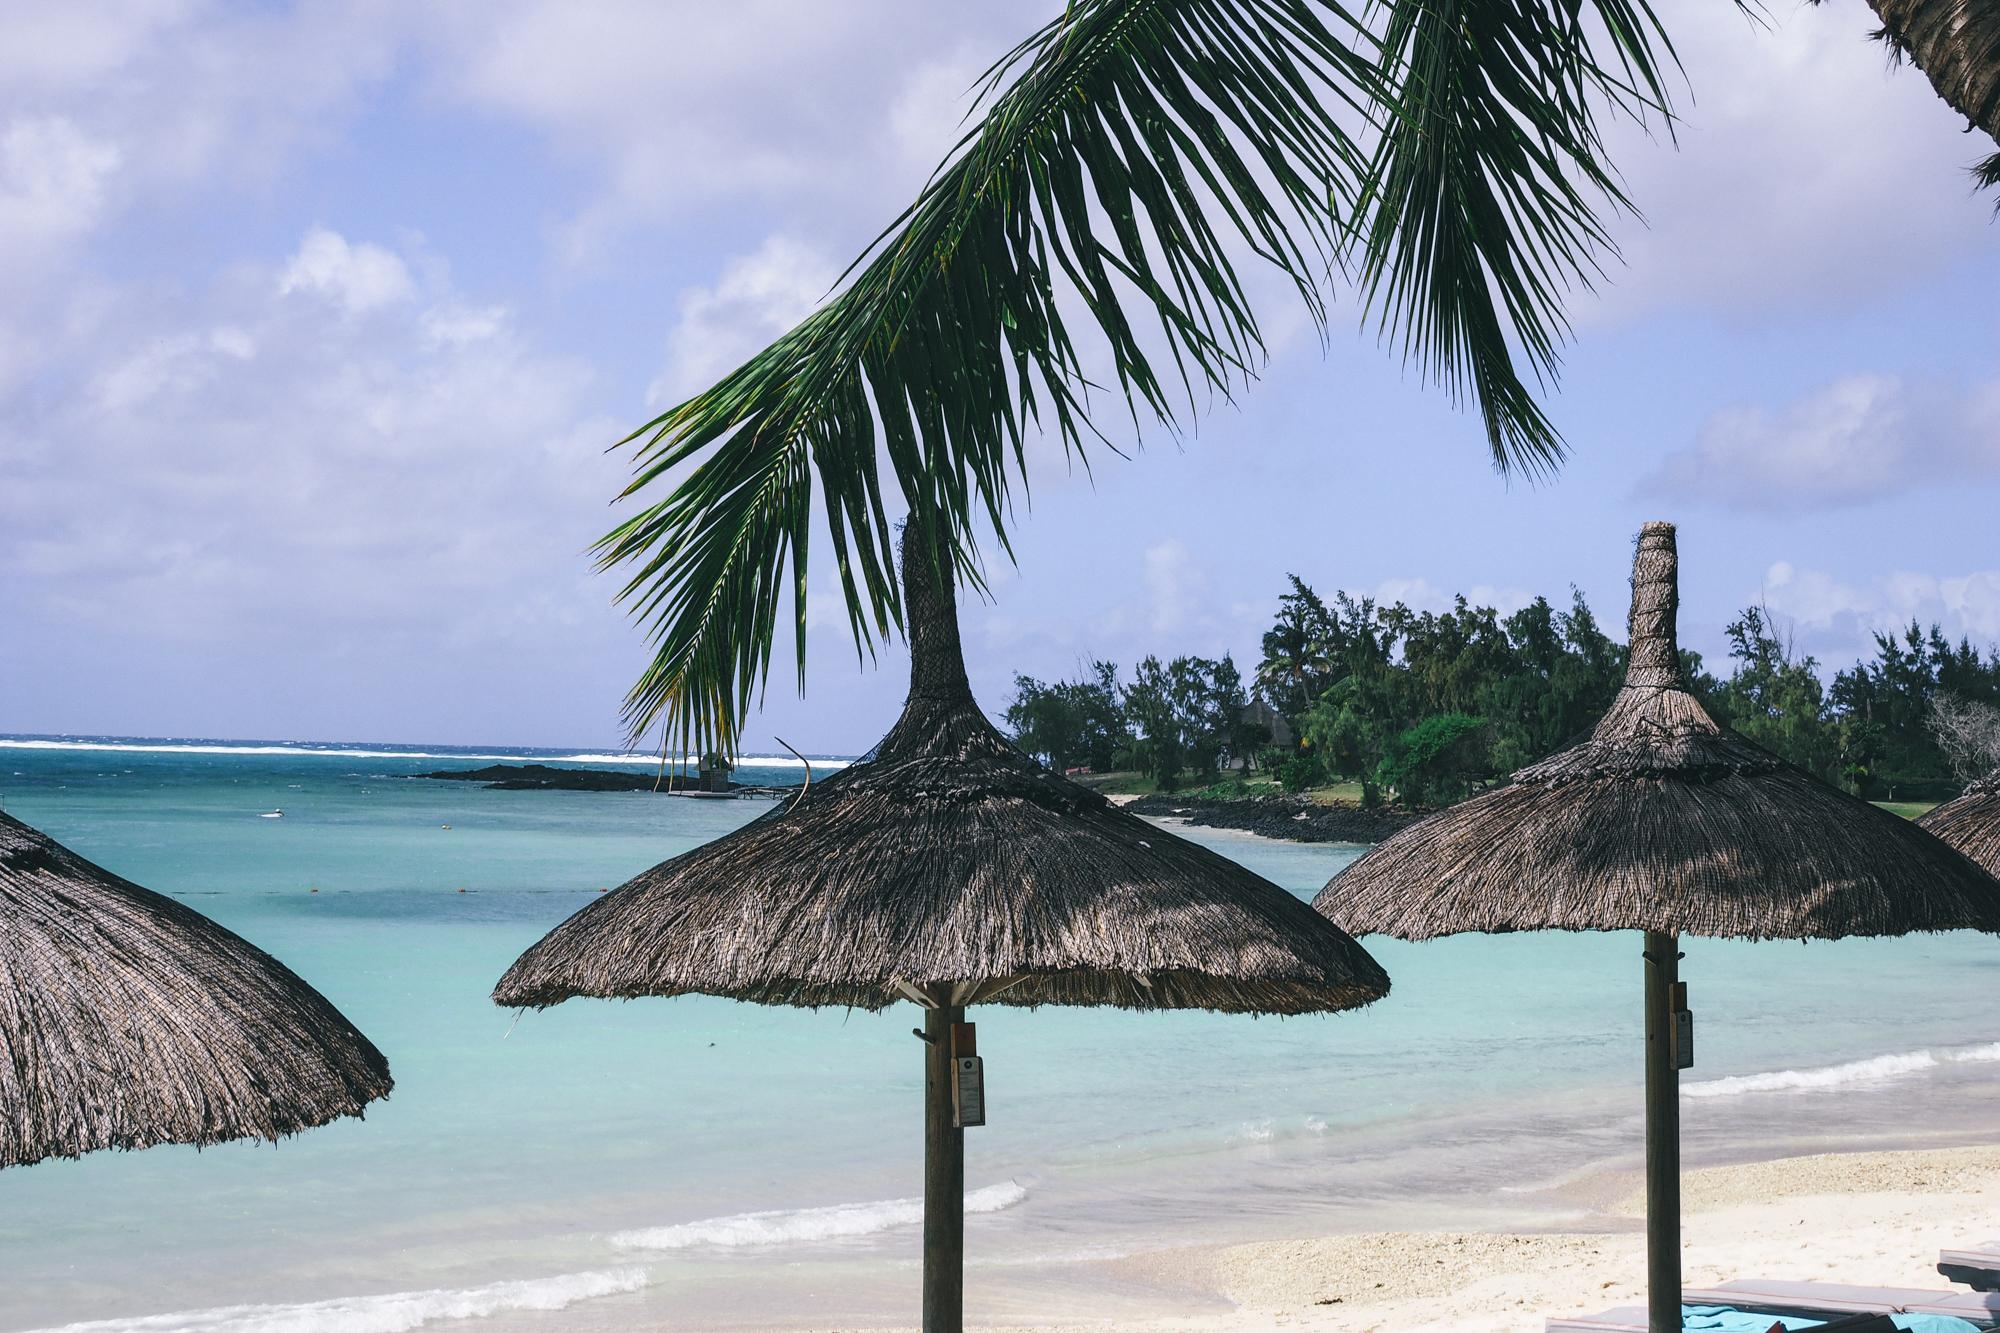 billur saatci, off ne giysem, off nereye gitsem, mauritius, hint okyanusu, seyahat, blogger, turkish style blogger